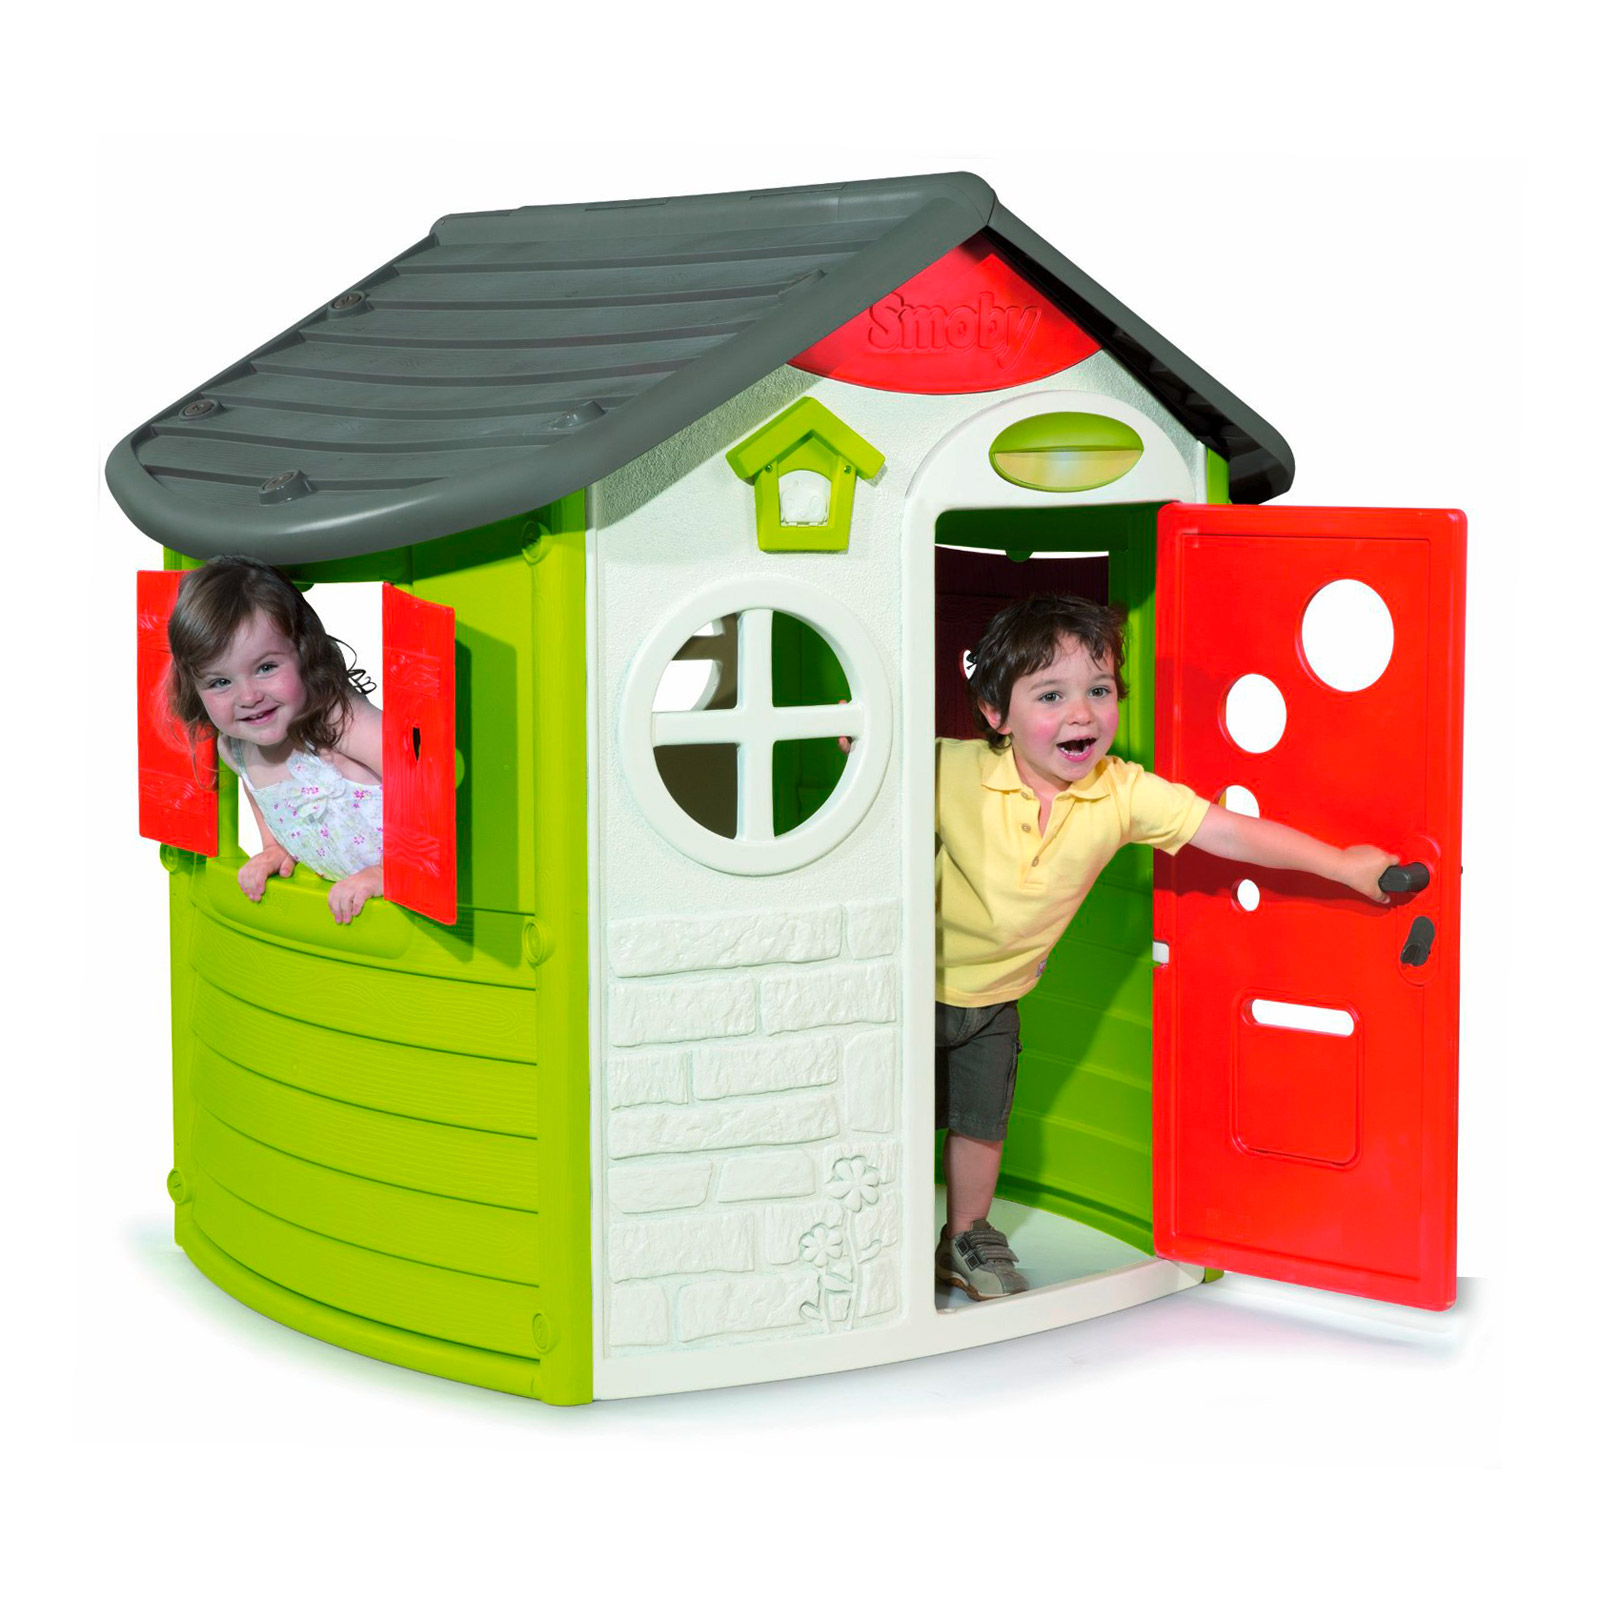 917791 smoby jura haus kinderzimmer garten spielhaus ebay. Black Bedroom Furniture Sets. Home Design Ideas